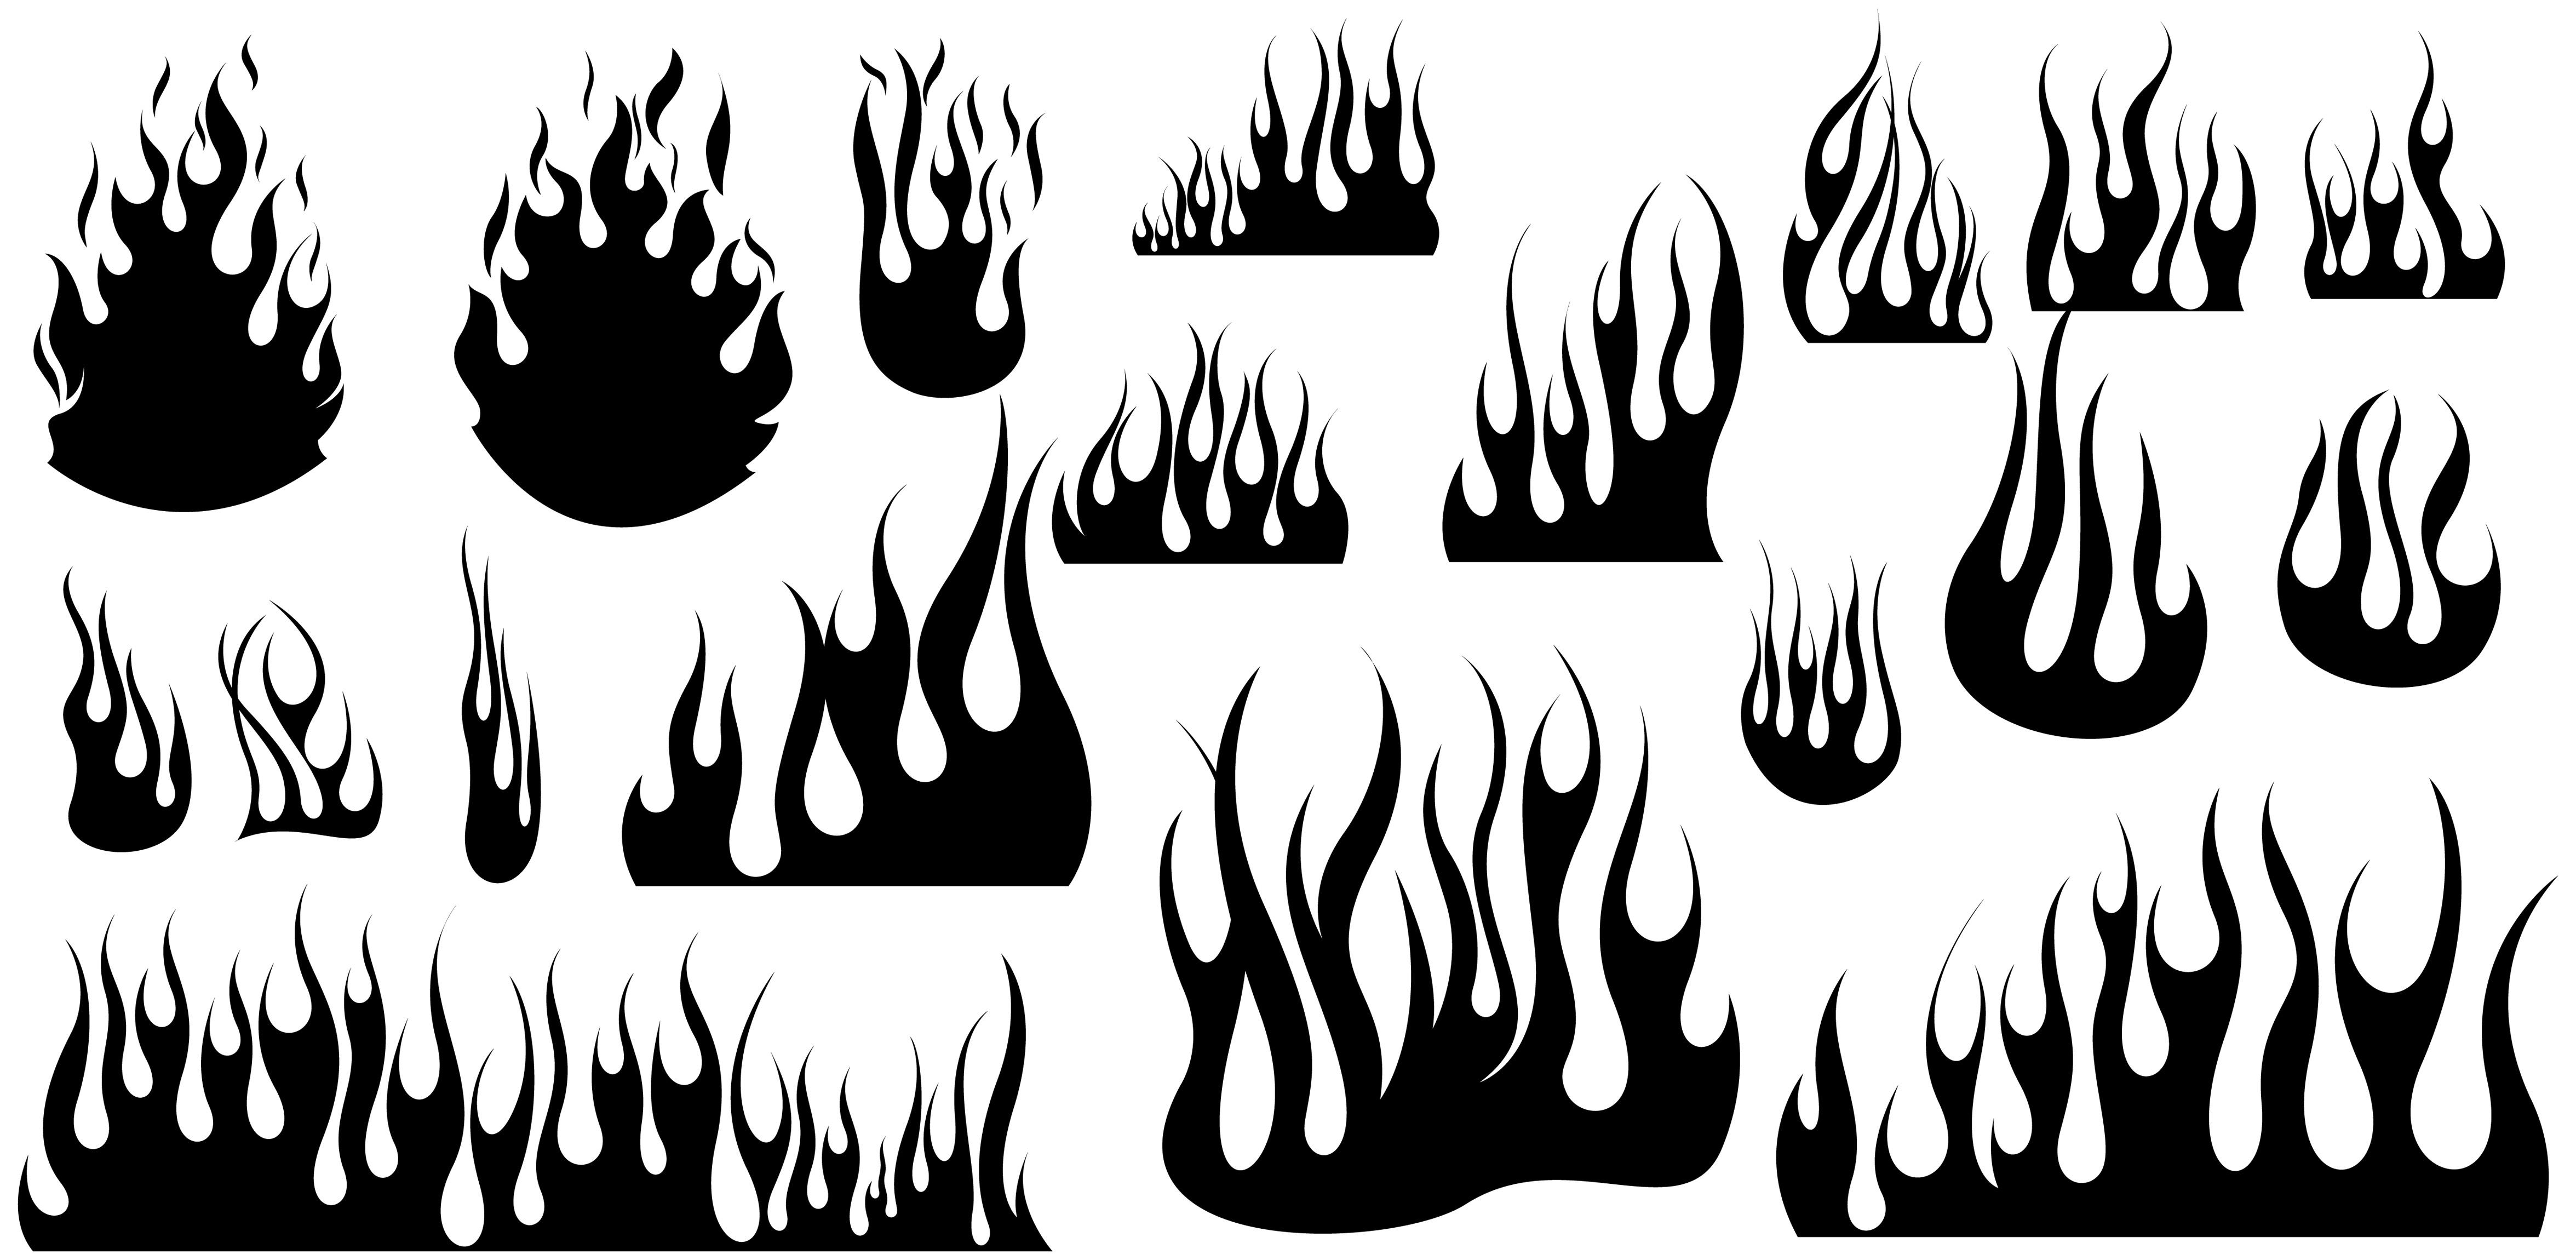 5 Vector Flames Black Images